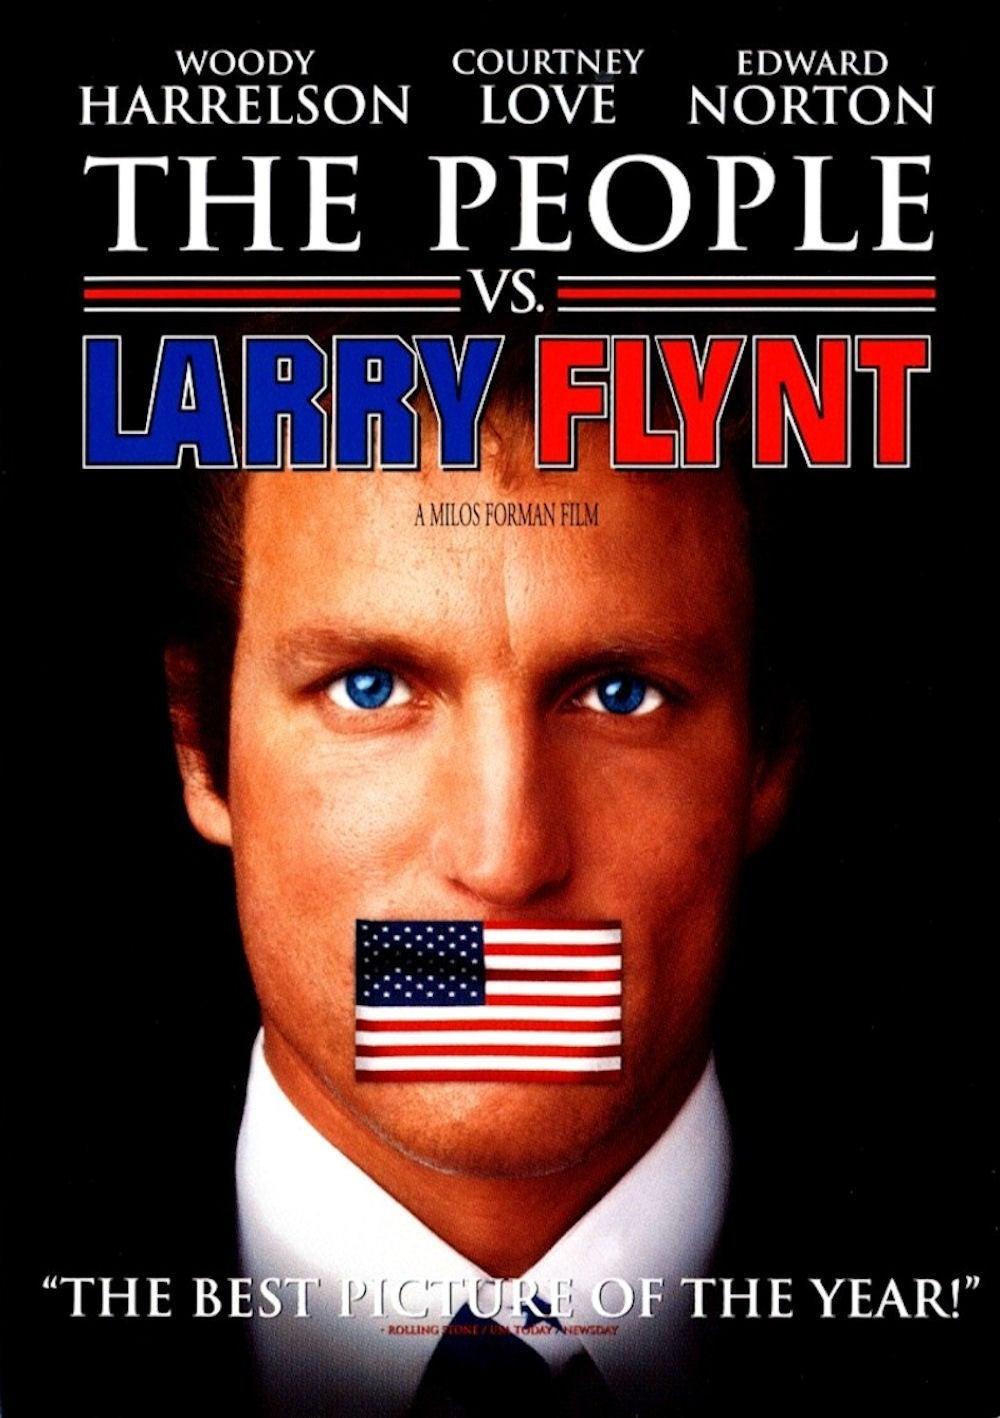 The people vs larry flynt 1996 sex or war - 1 10